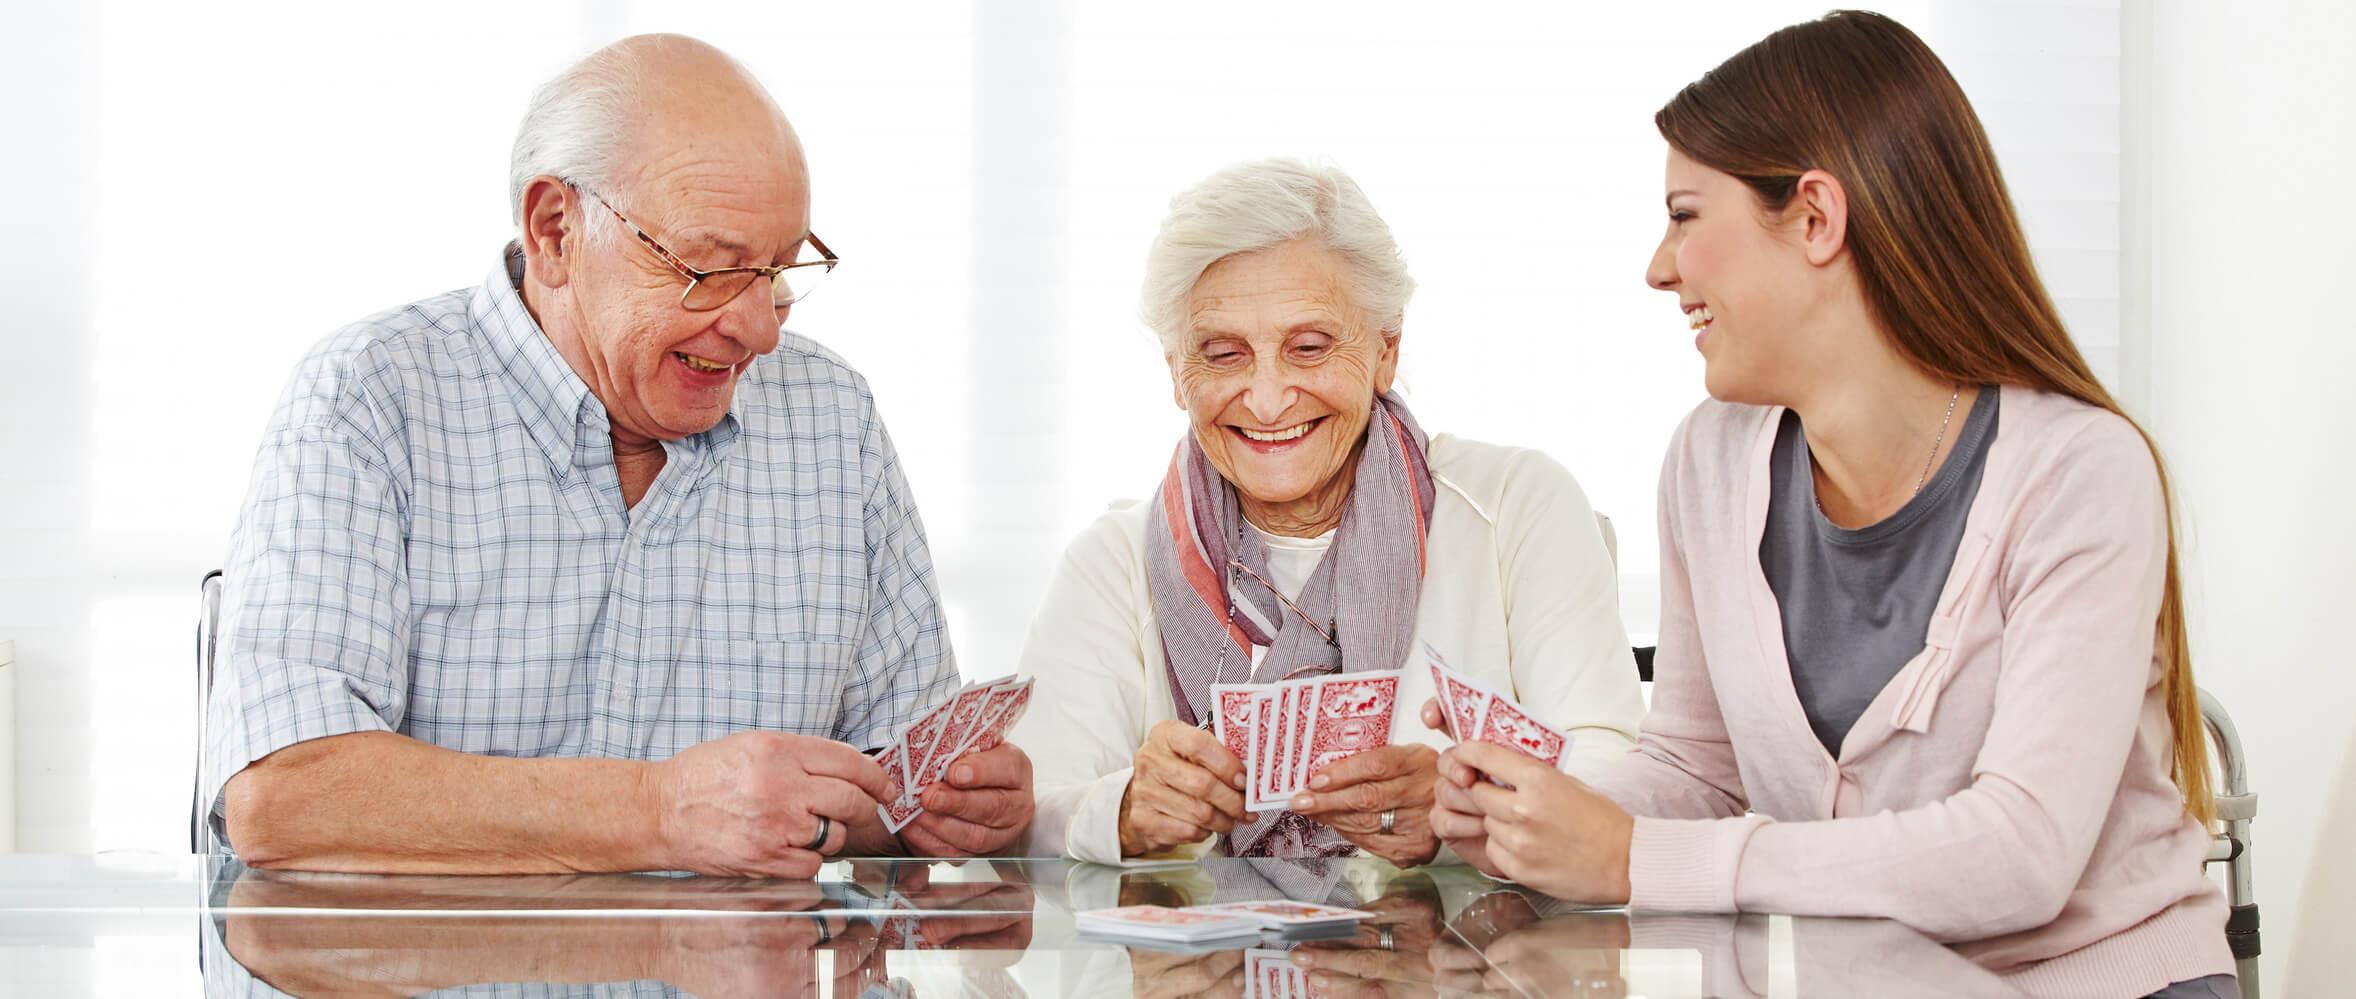 Seniorentreff